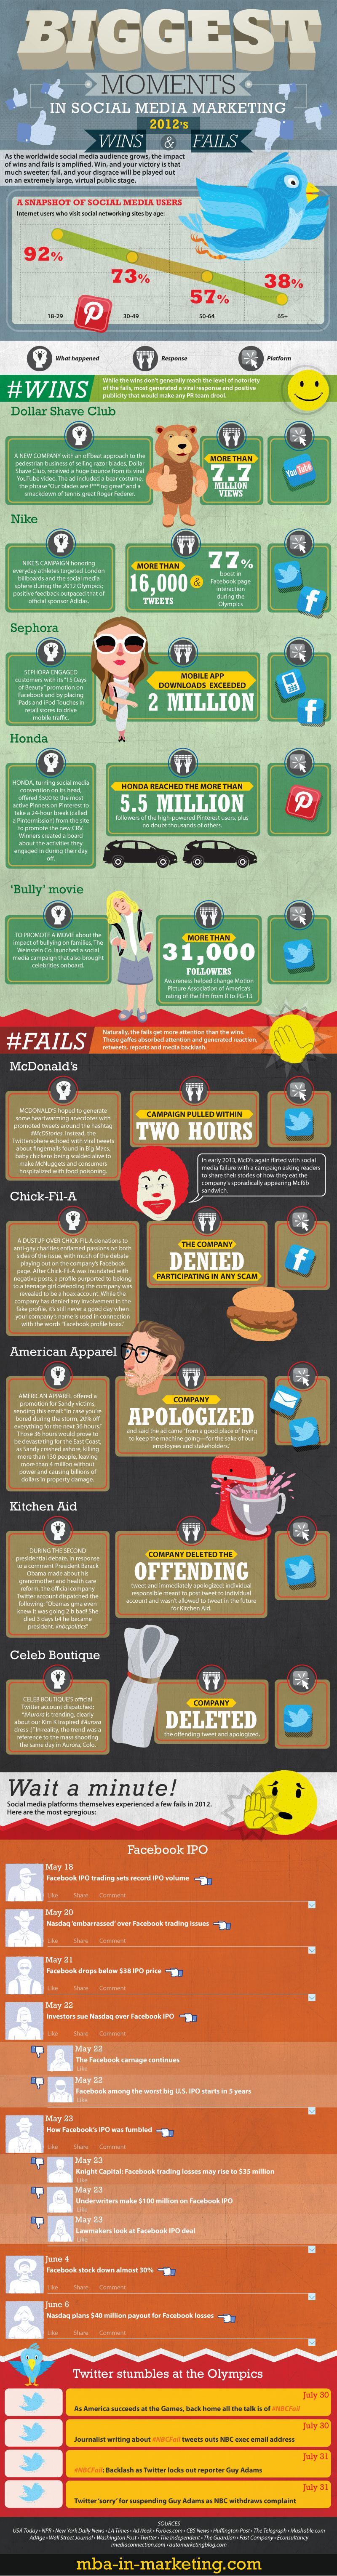 Biggest Moments In Social Media Marketing